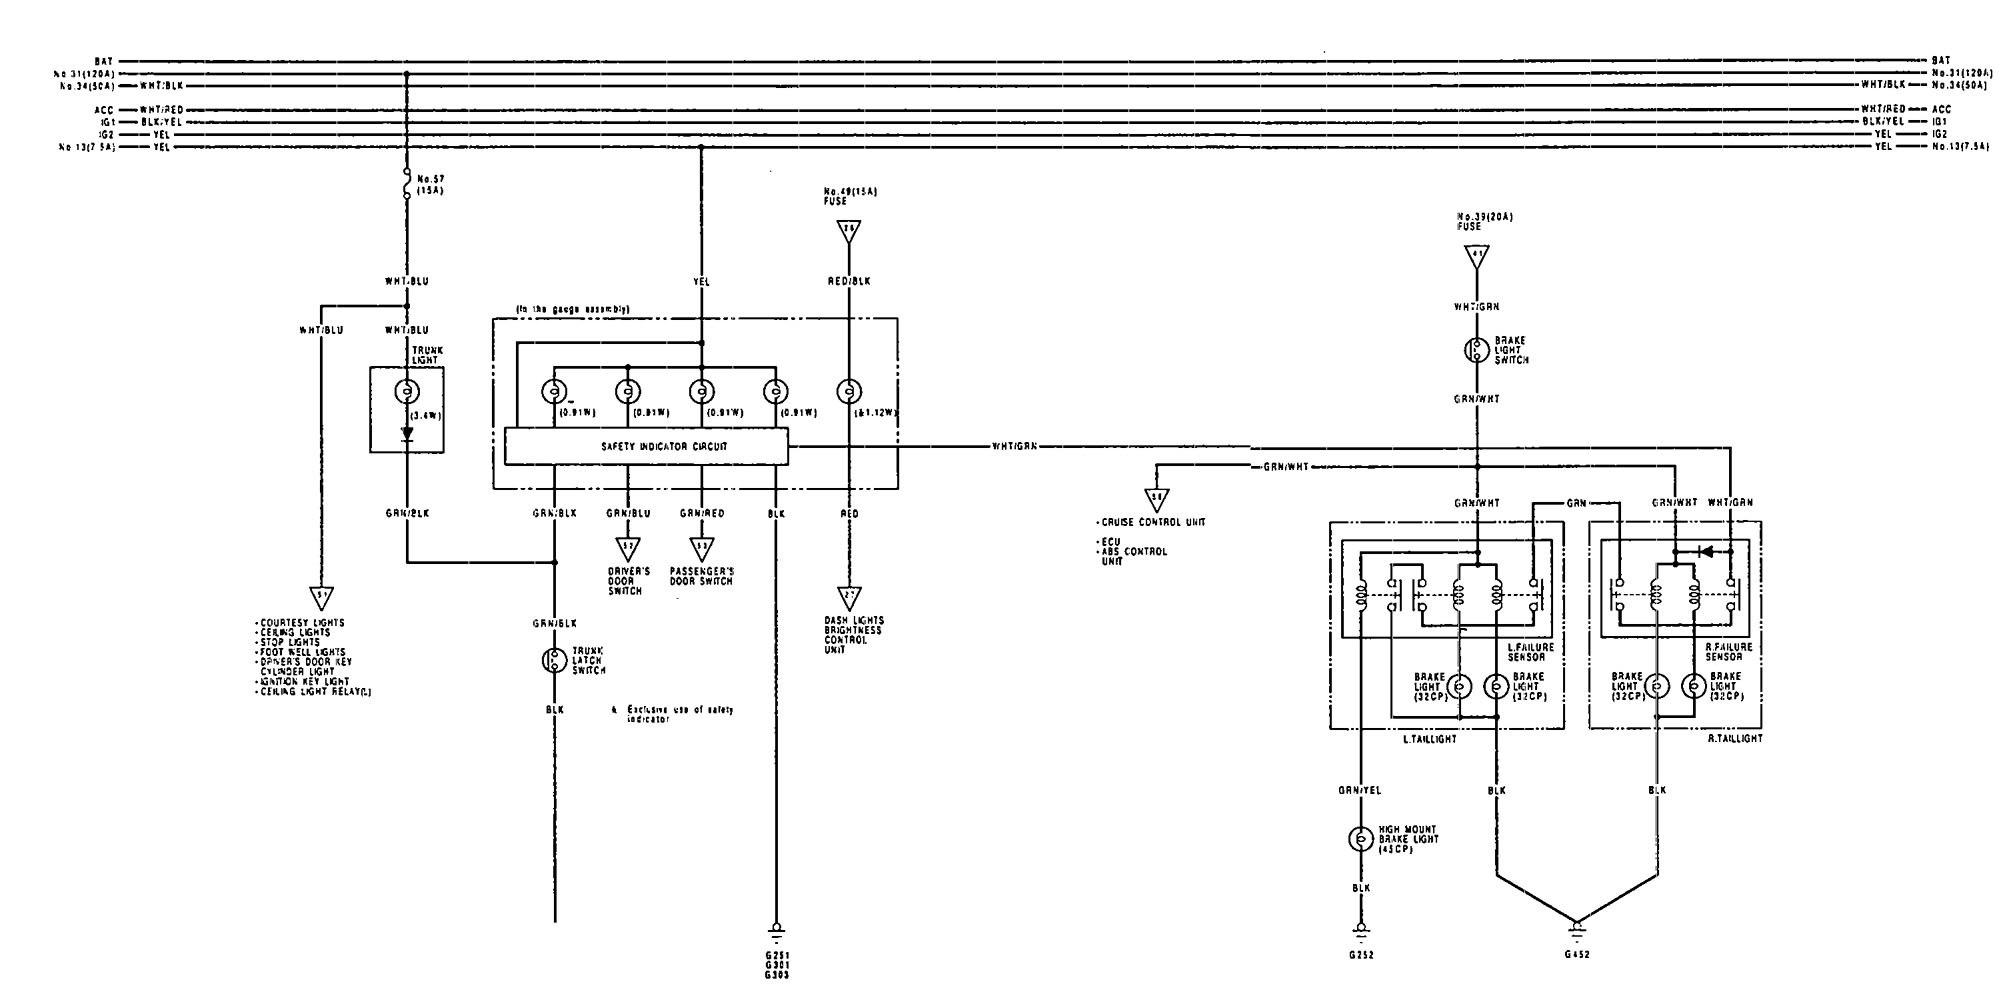 1994 acura legend radio wiring diagram mk4 jetta imageresizertool com